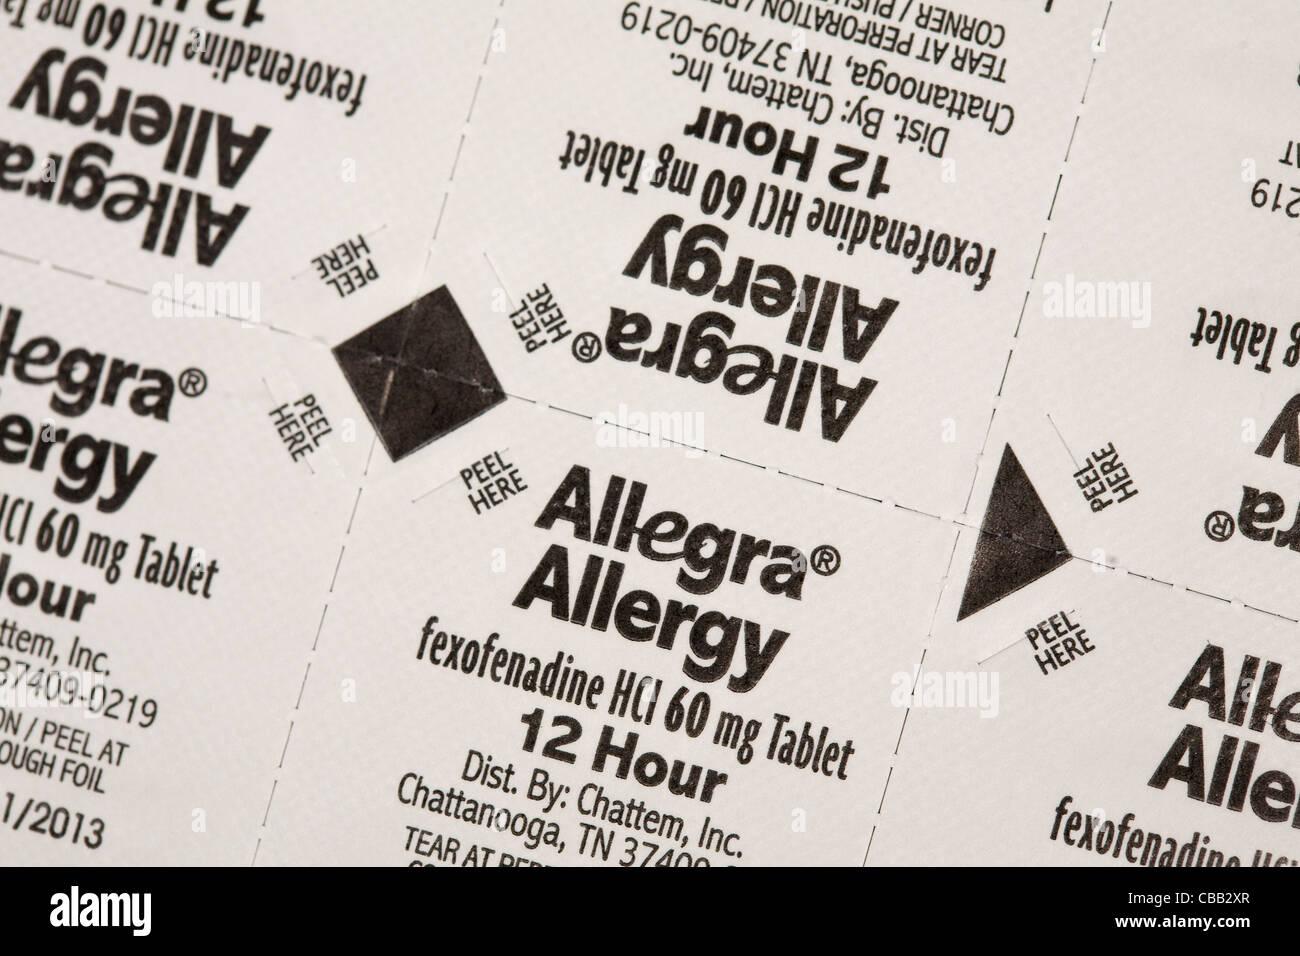 Allegra allergy medicine - Stock Image